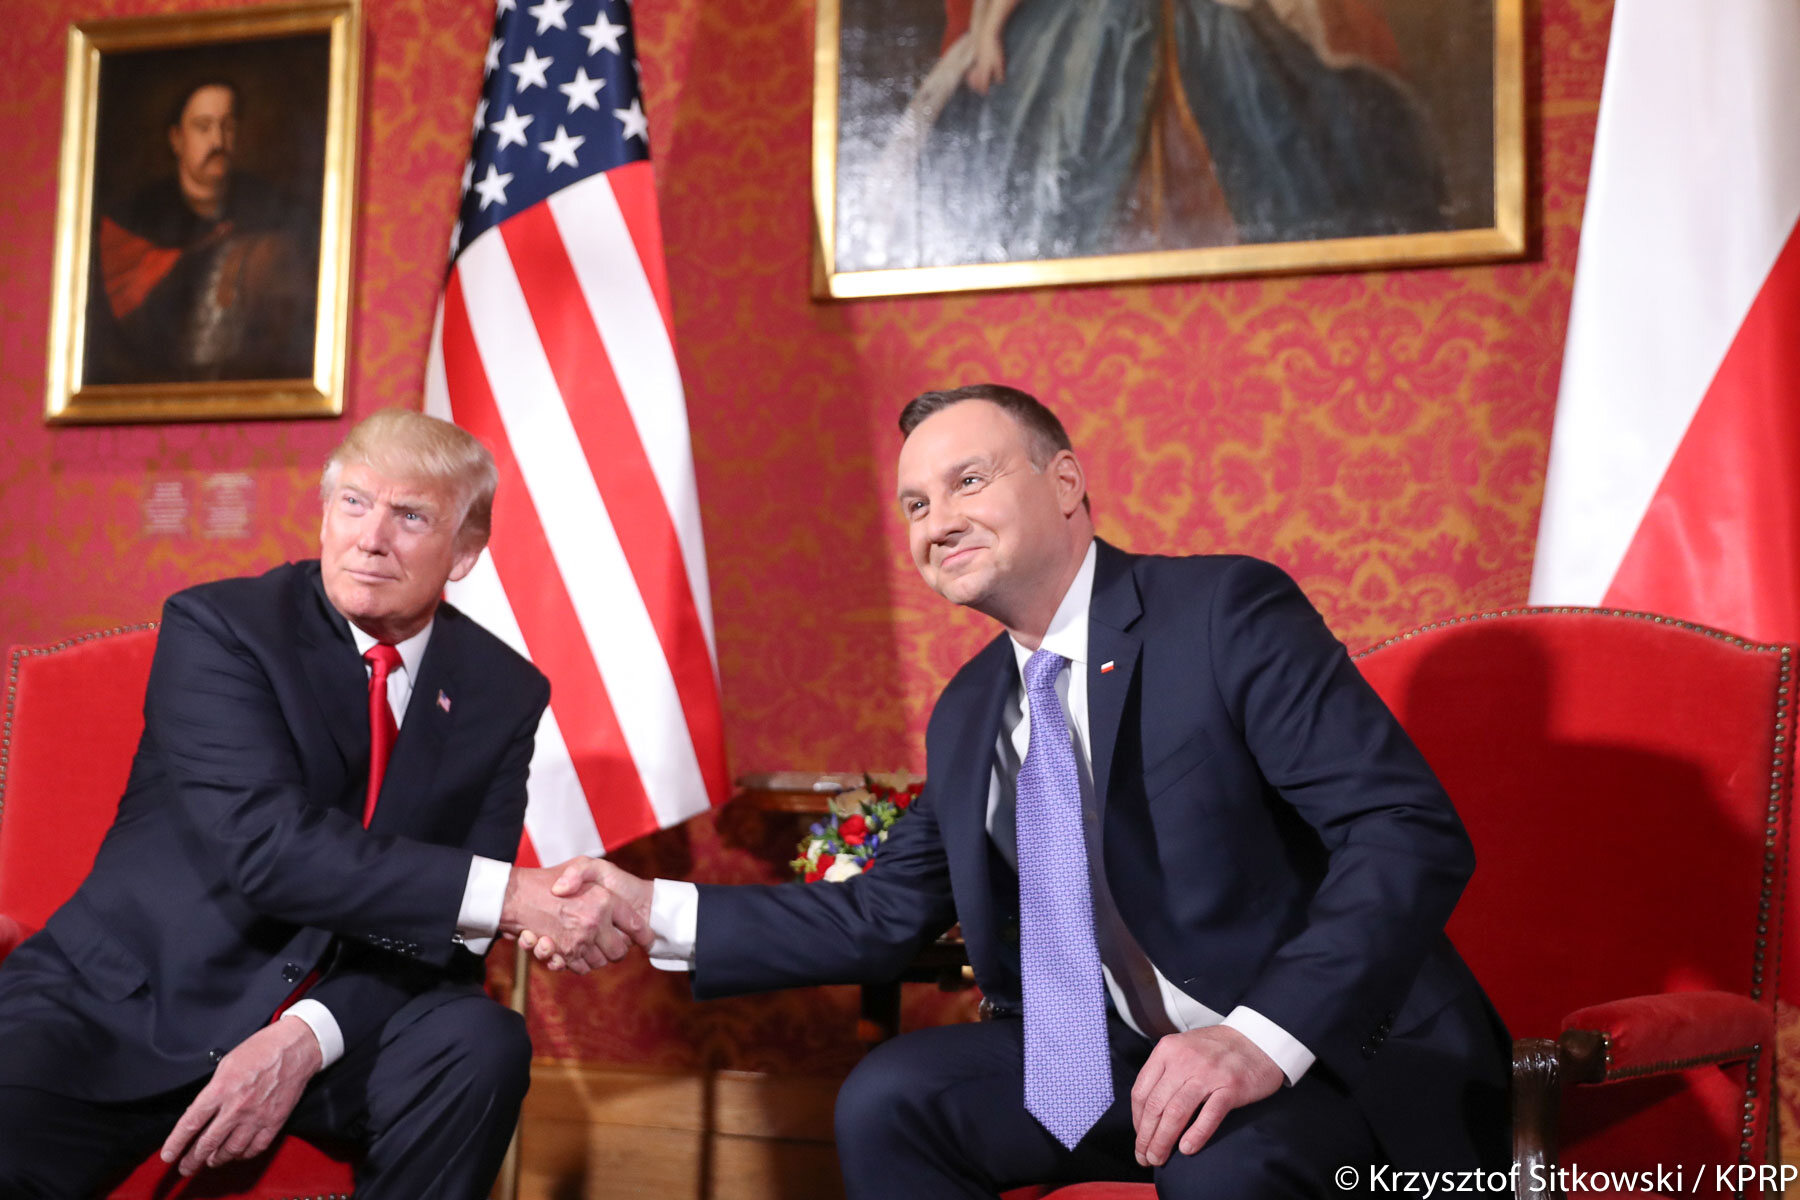 Prezydenci Polski i USA, Andrzej Duda i Donald Trump